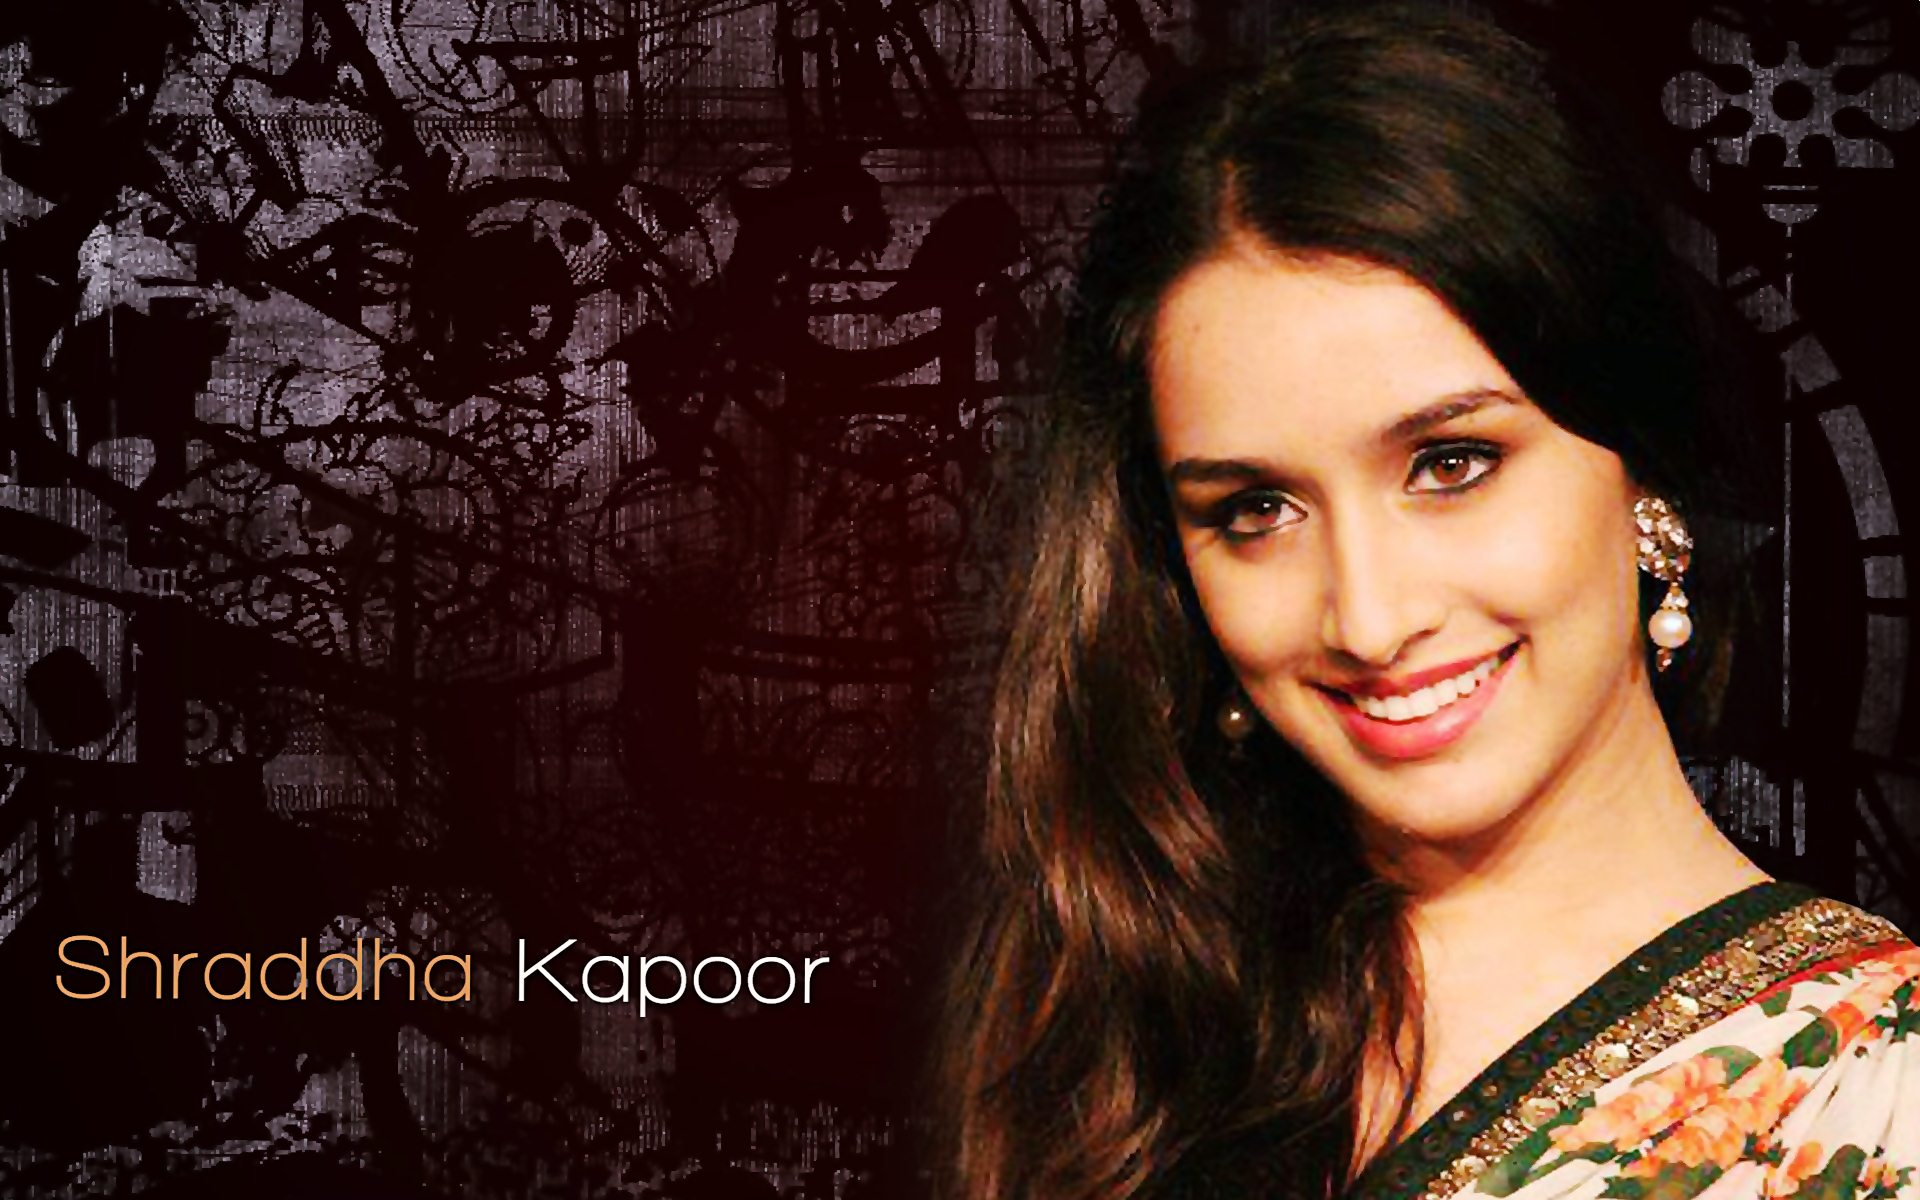 Shraddha Kapoor Beautiful HD Wallpaper